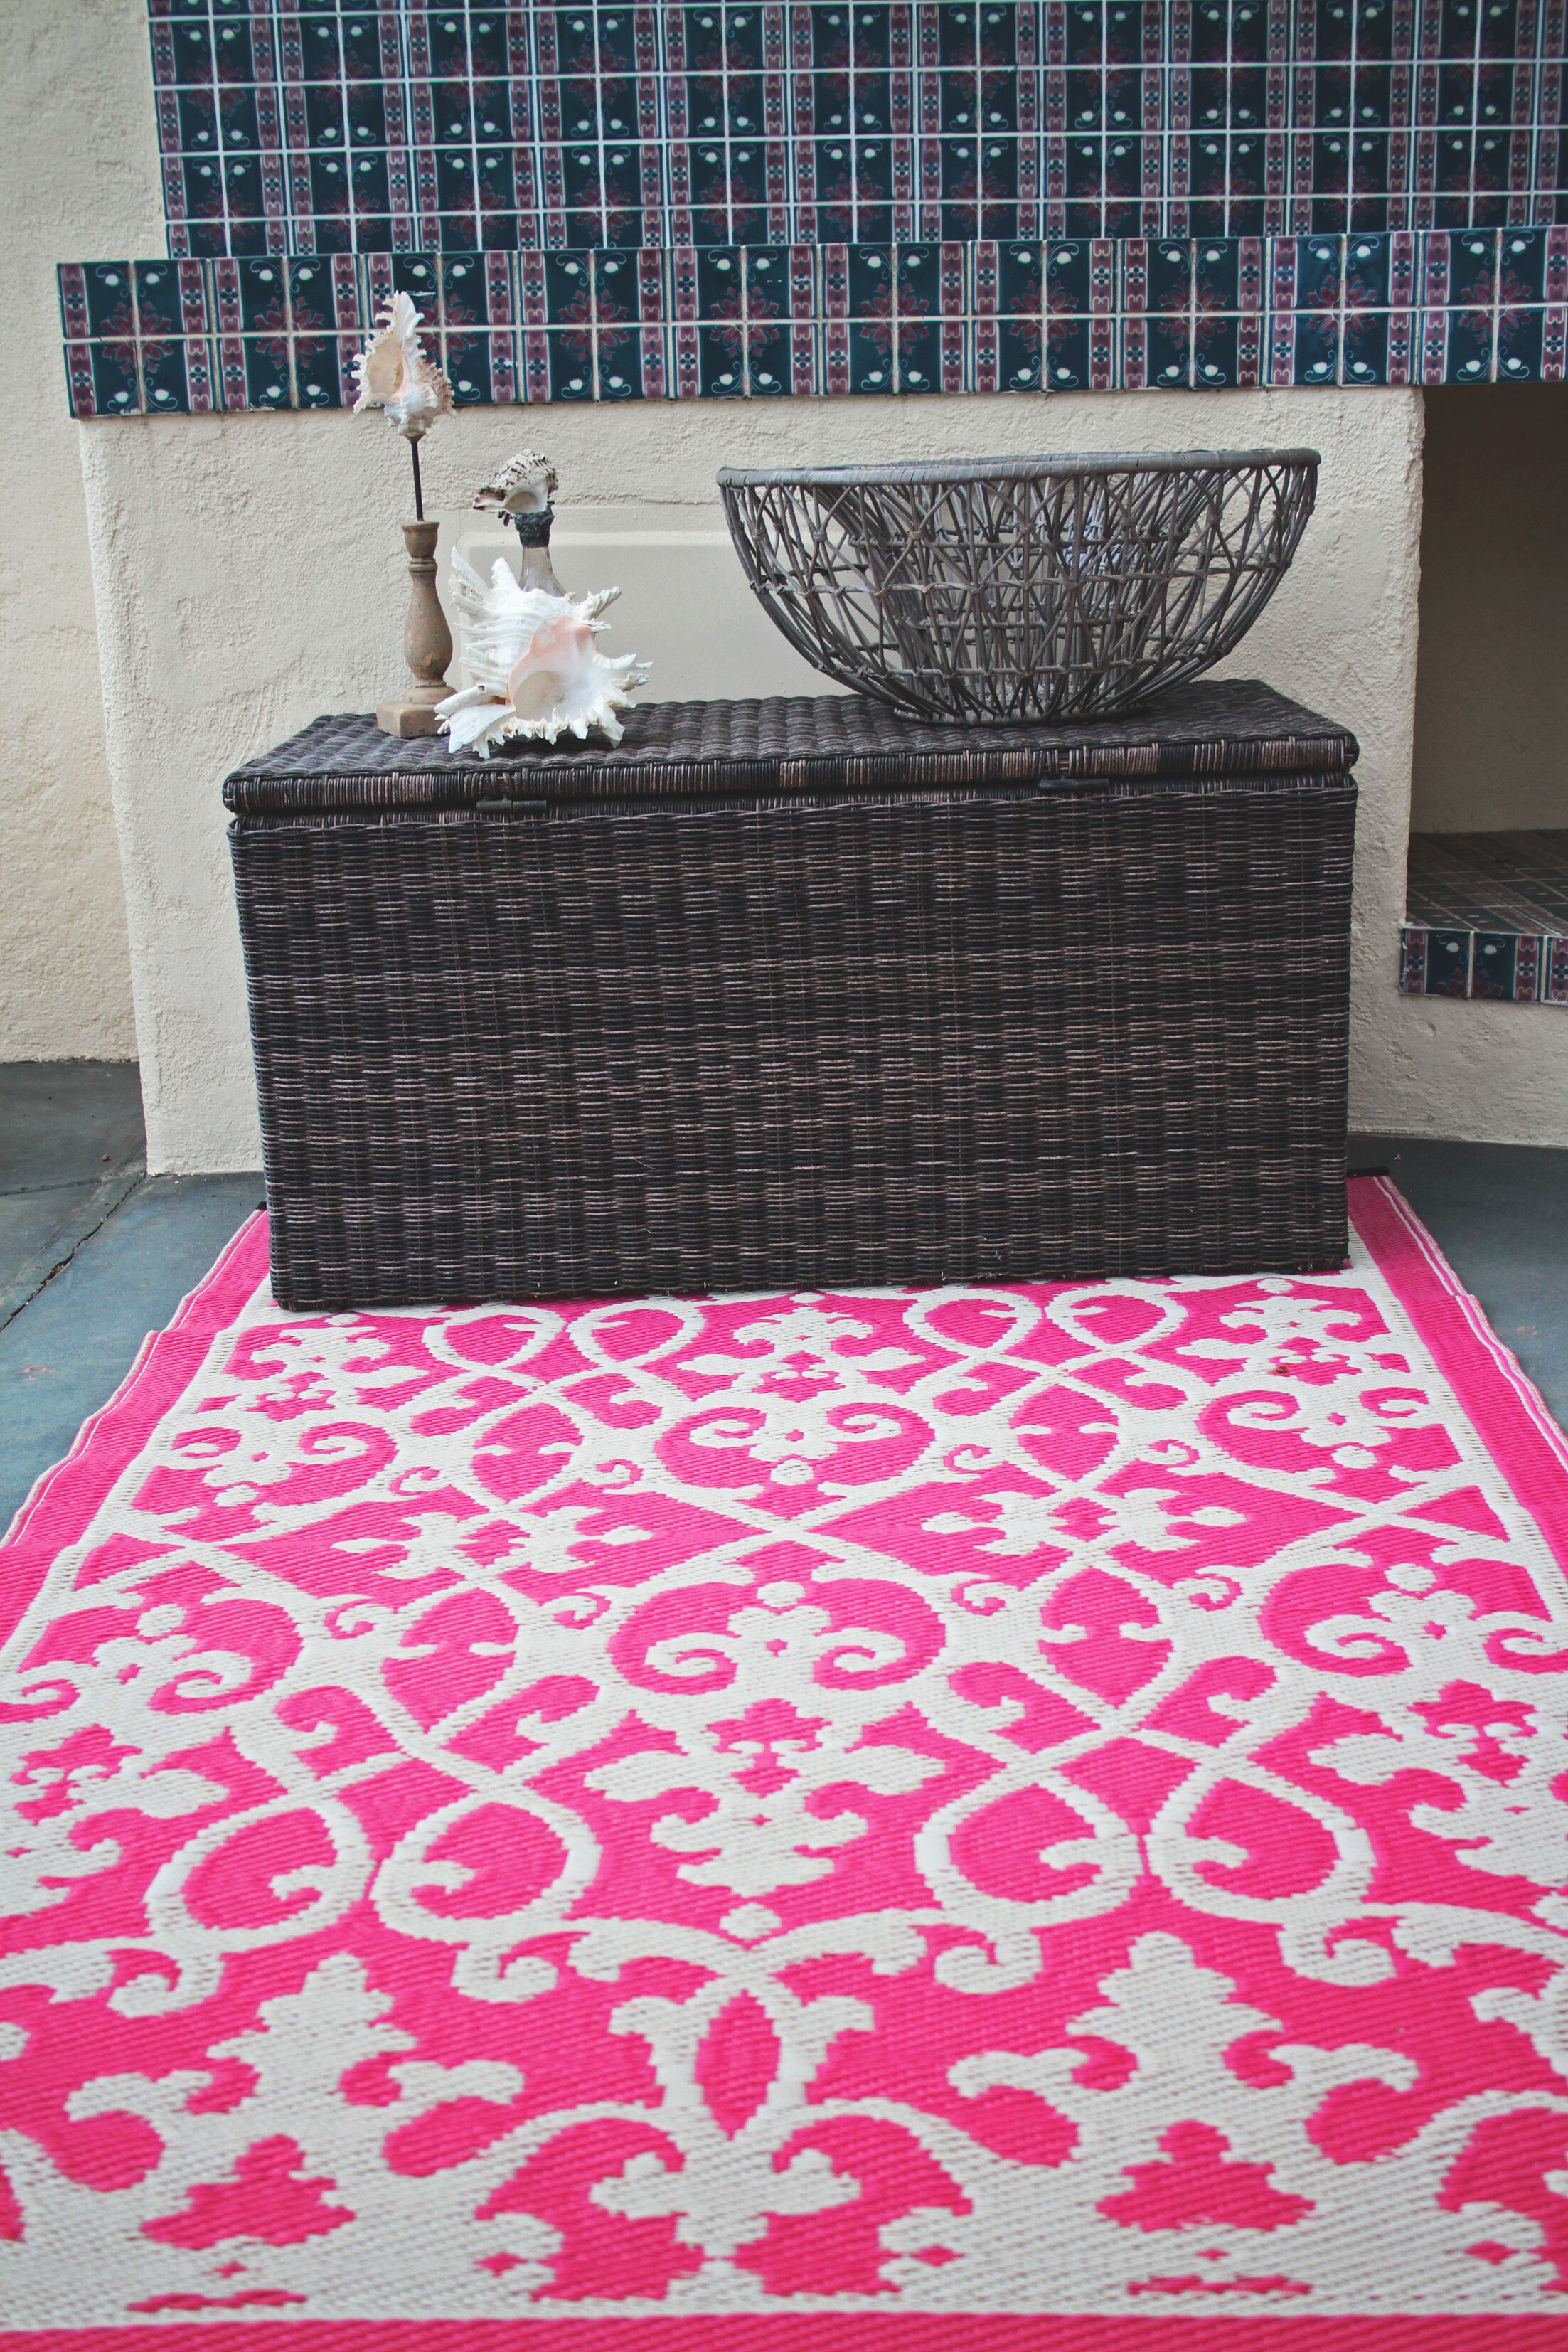 Fontayne Cream & Pink Indoor/Outdoor Area Rug Rug Size: Rectangle 4' x 6'